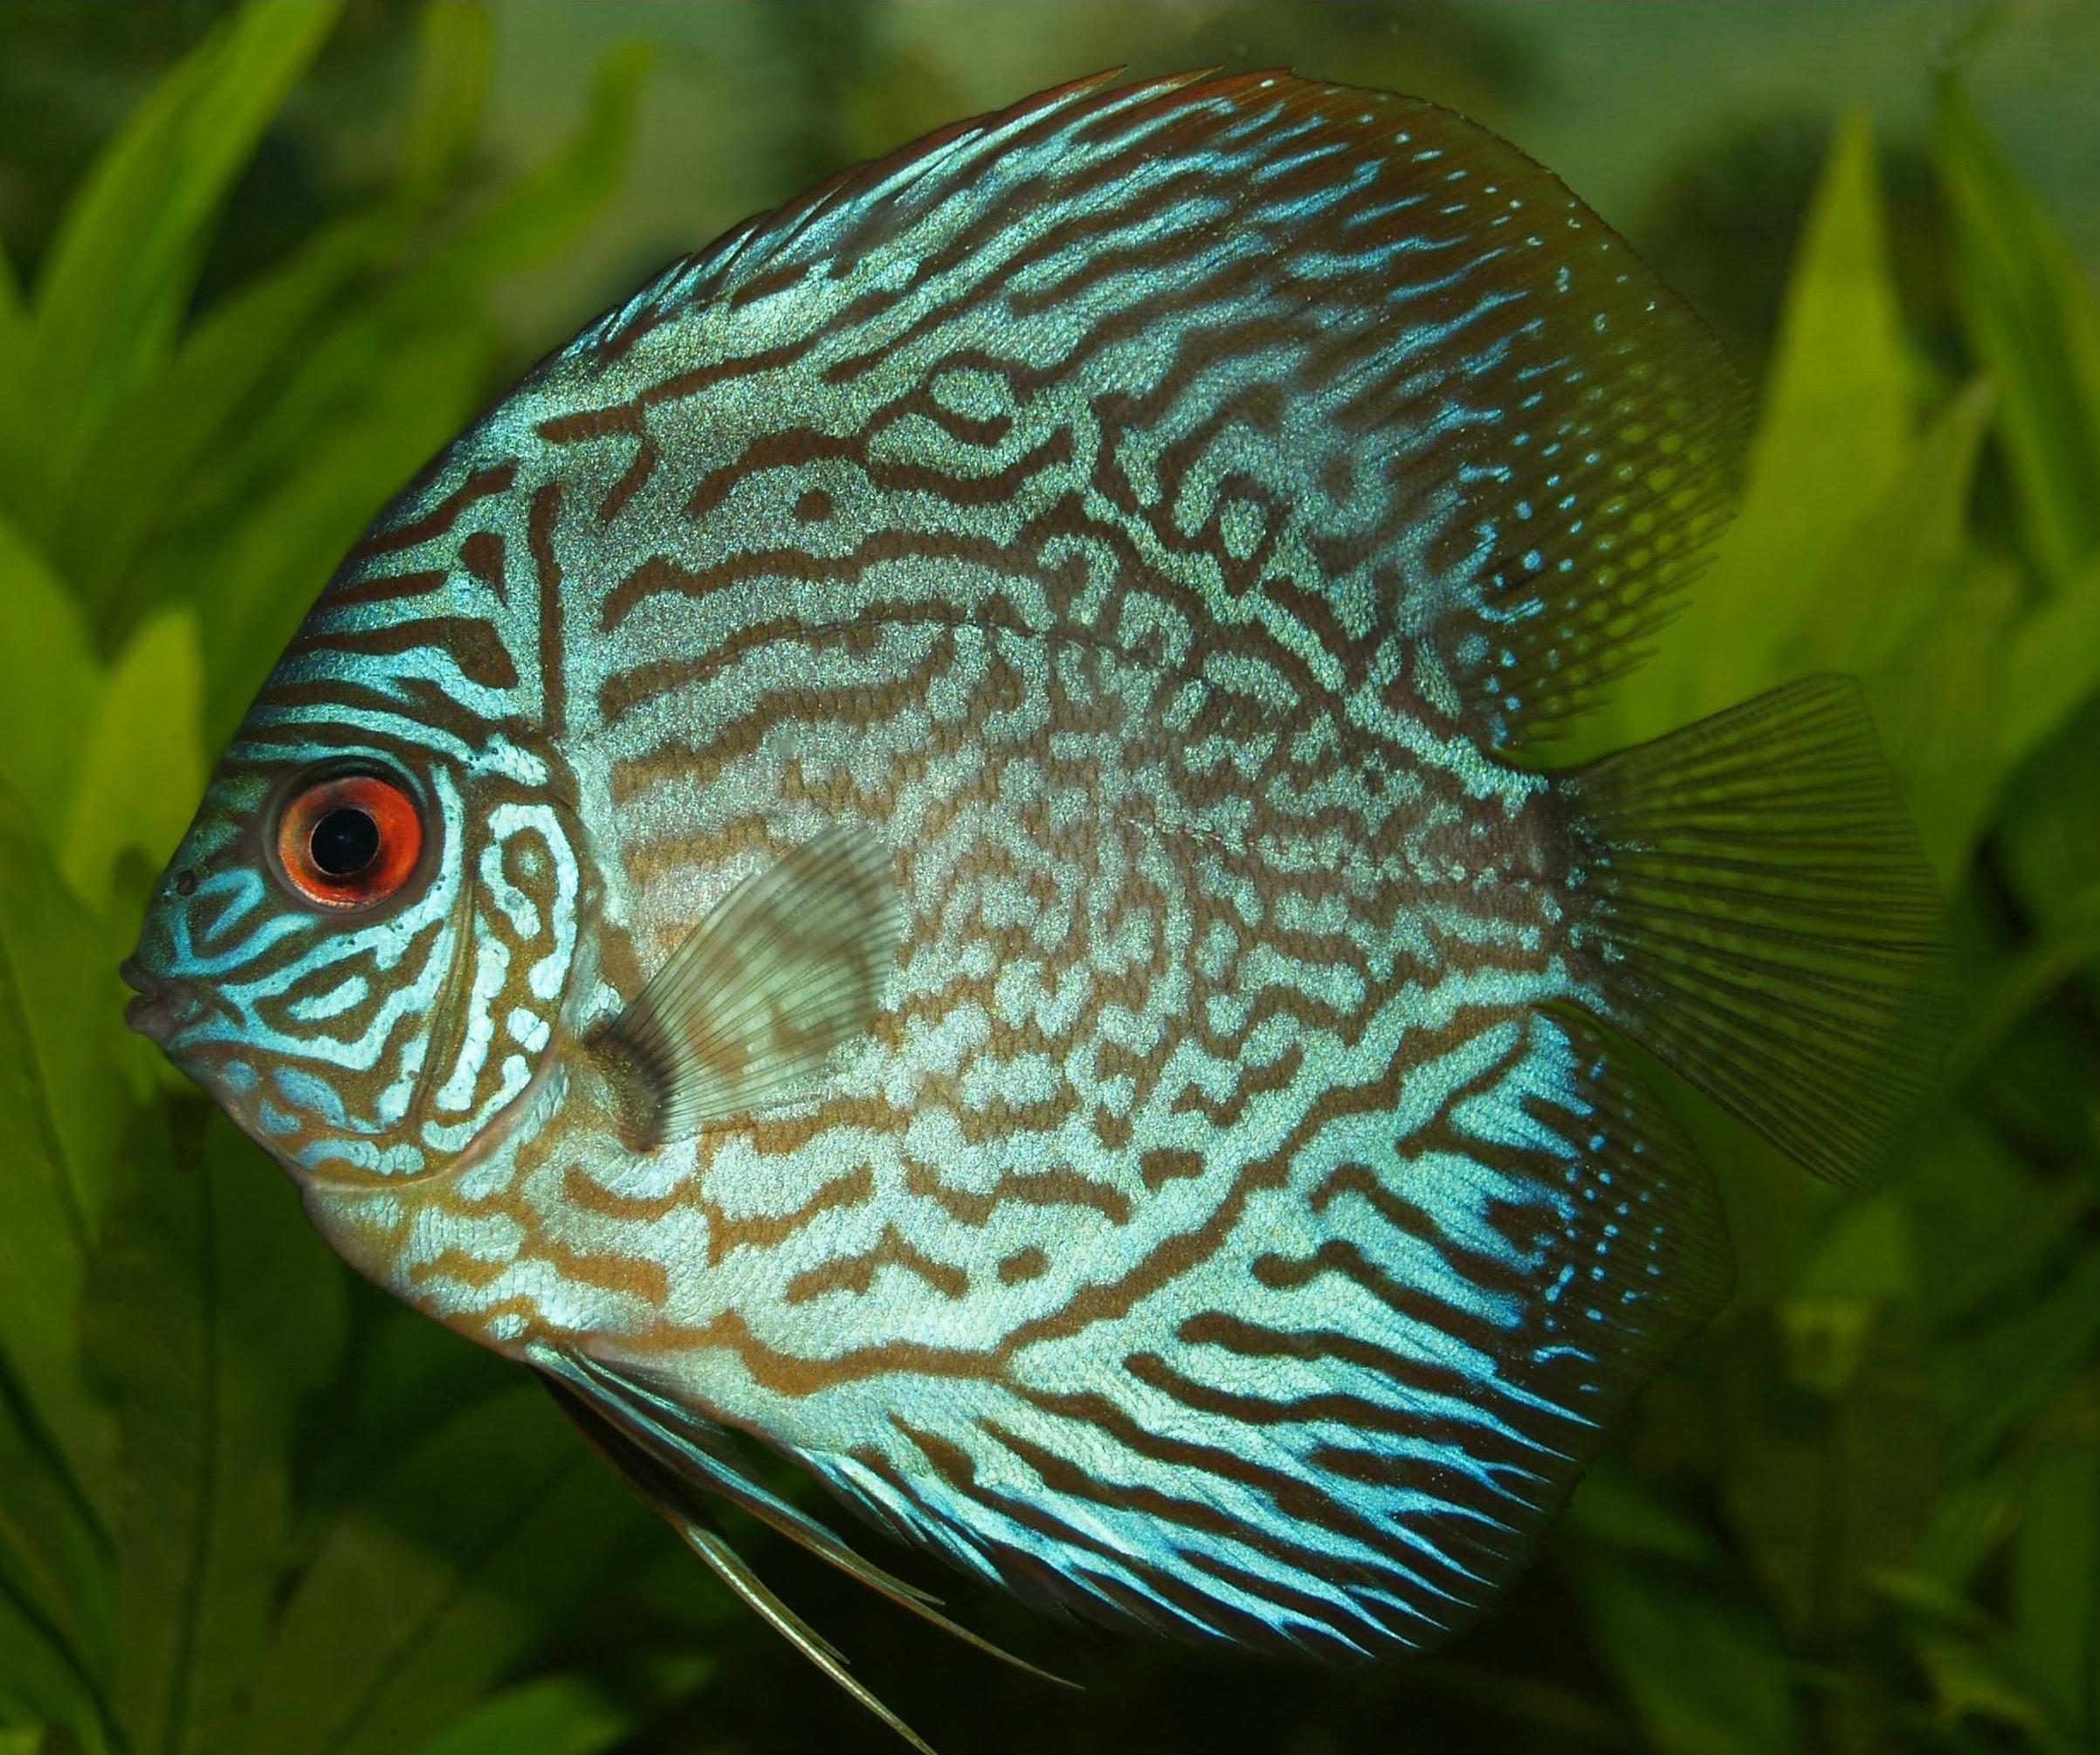 Freshwater aquarium fish for cheap - Freshwater Aquariums Discus Fish